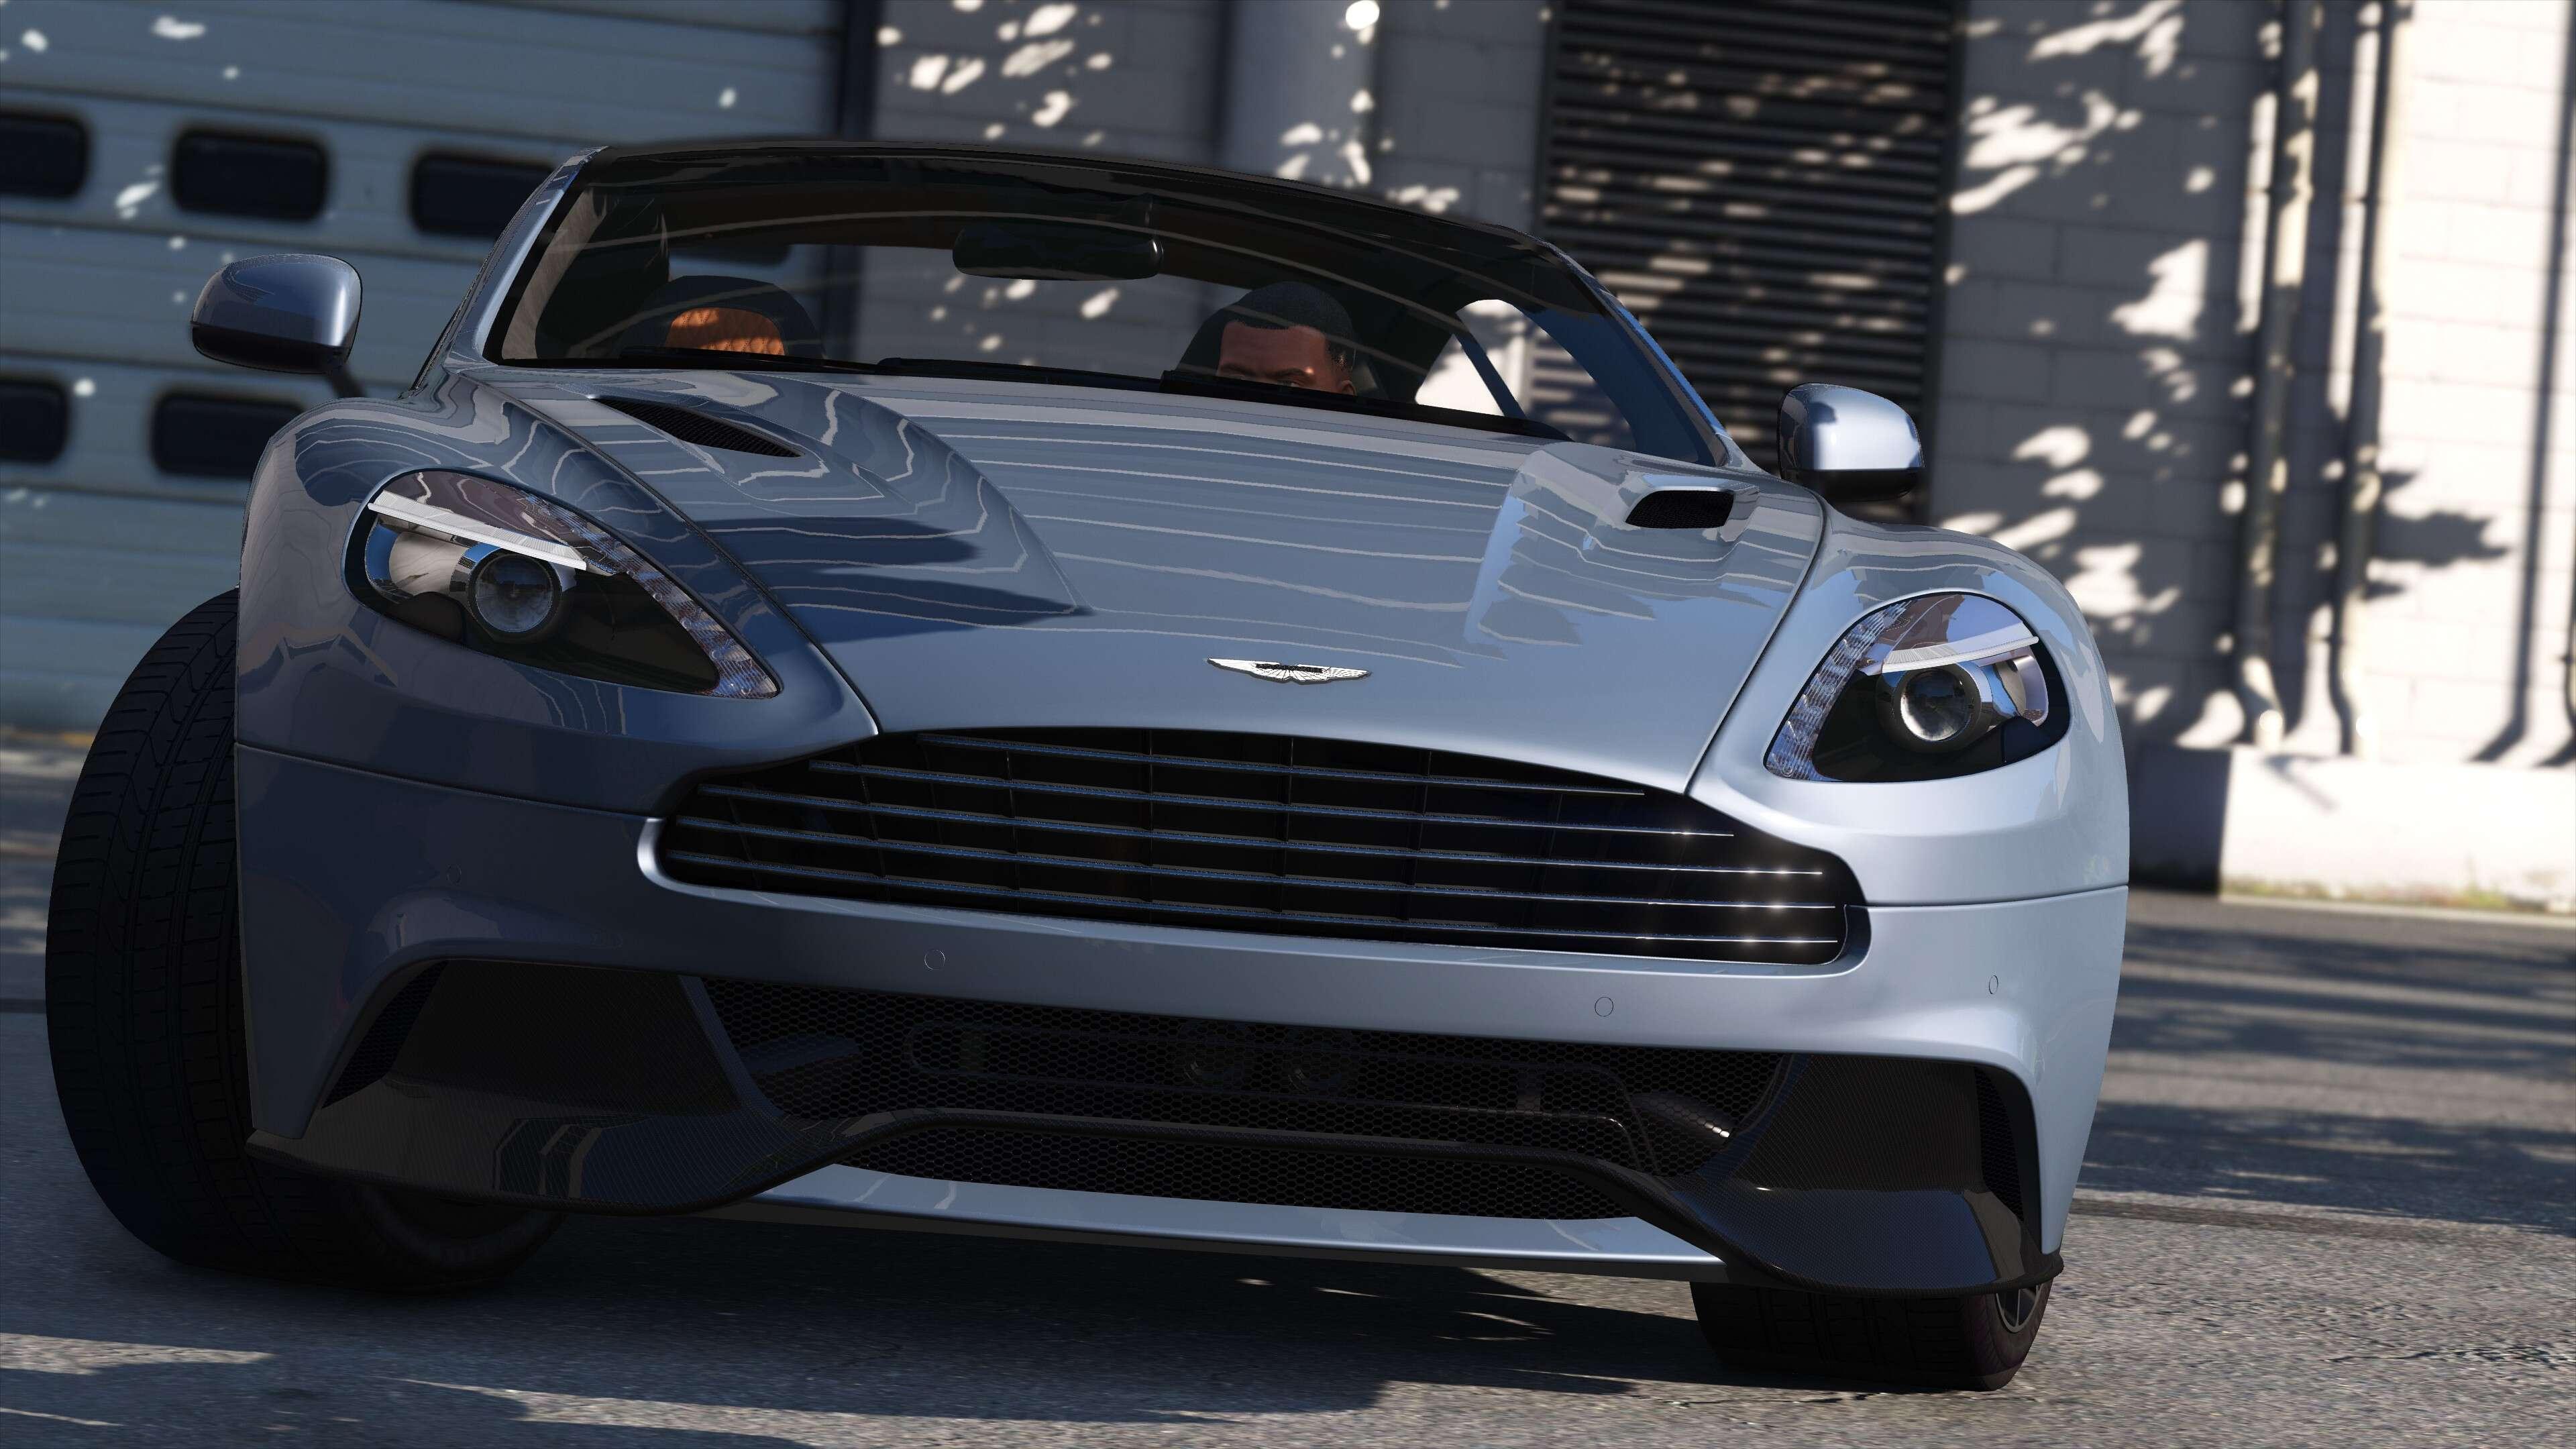 2013 Aston Martin Vanquish [Add Replace] GTA5 Mods